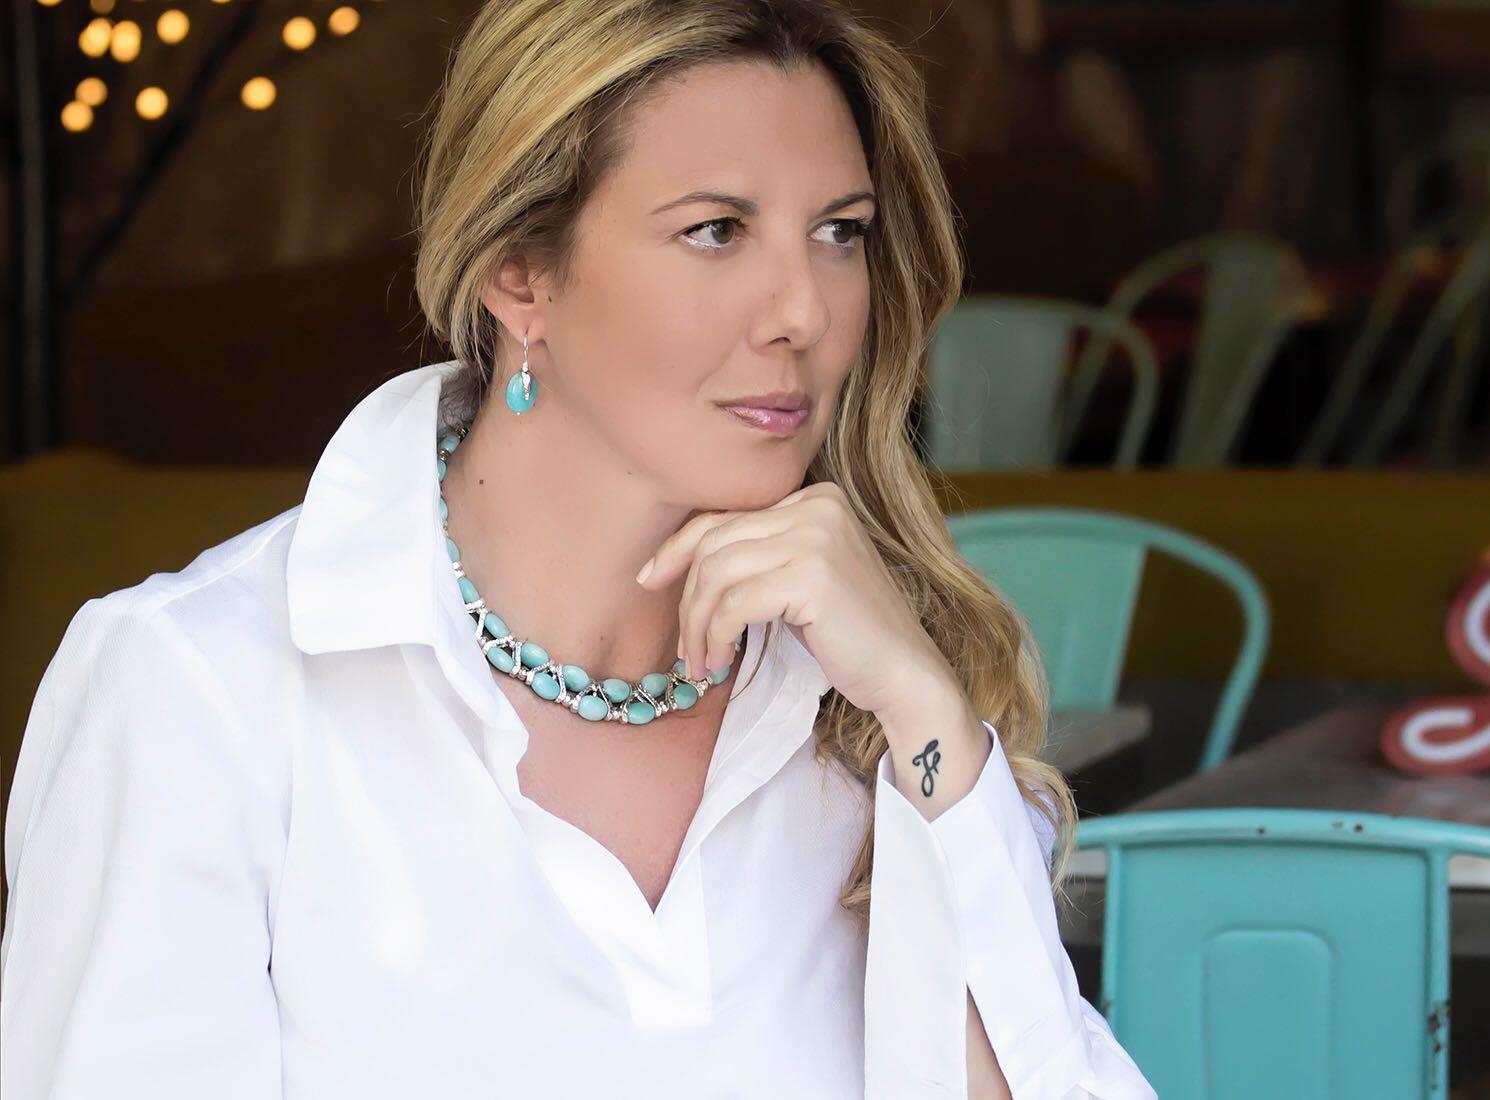 Athena Gioielli